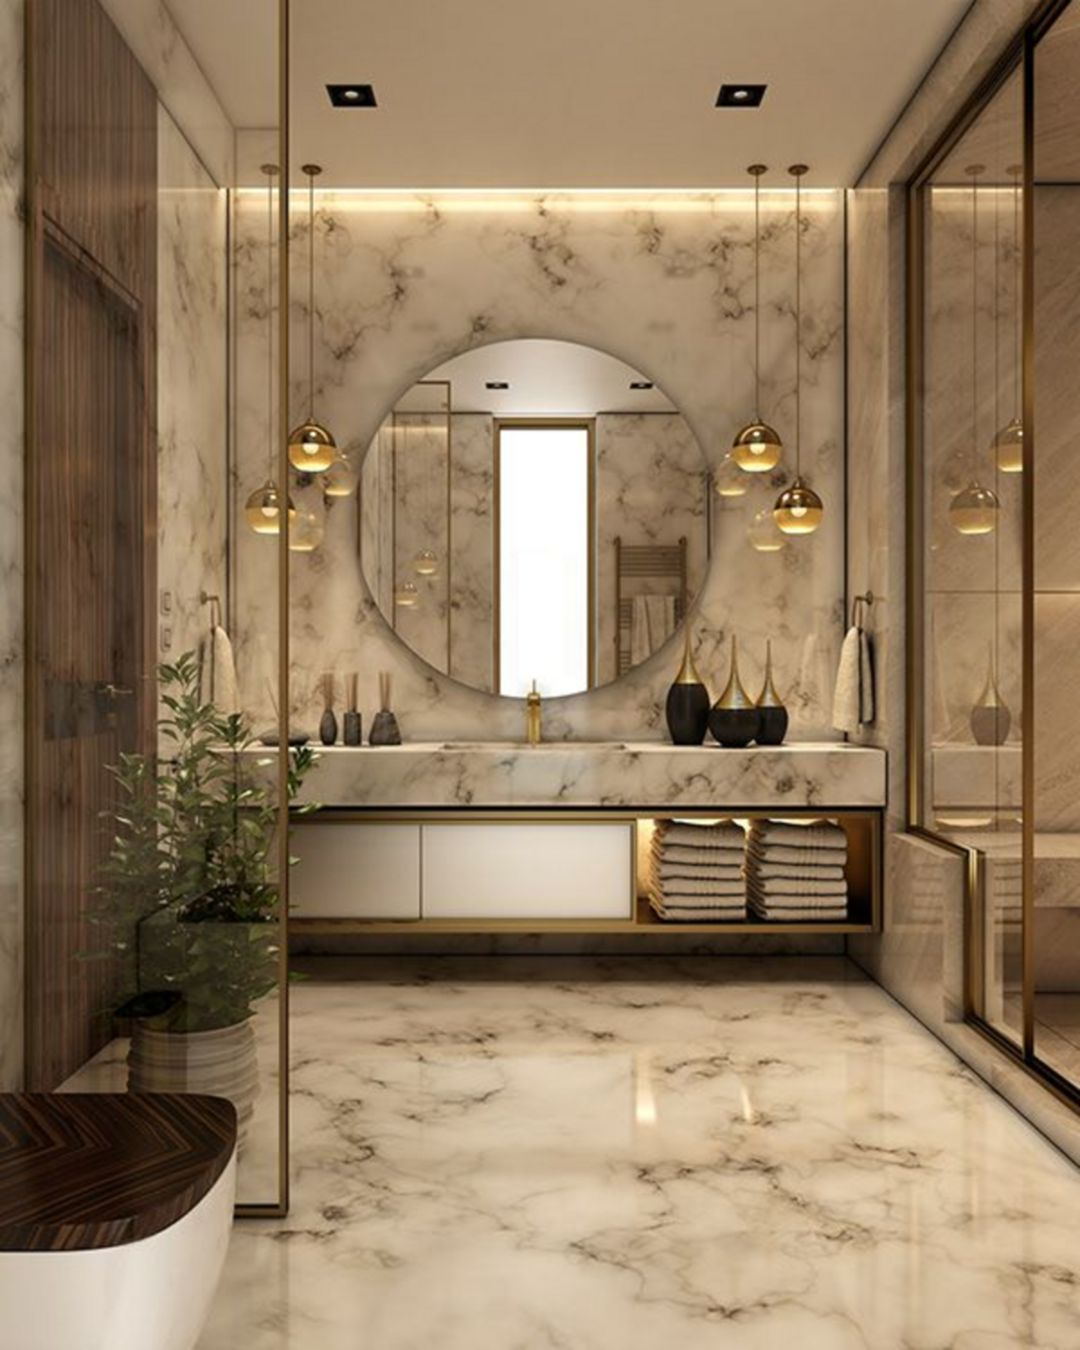 Enchanting Luxurious Bathroom Decorating Ideas 035 Decor Gardening Ideas Bathroom Remodel Cost Bathroom Interior Design Living Room Candles